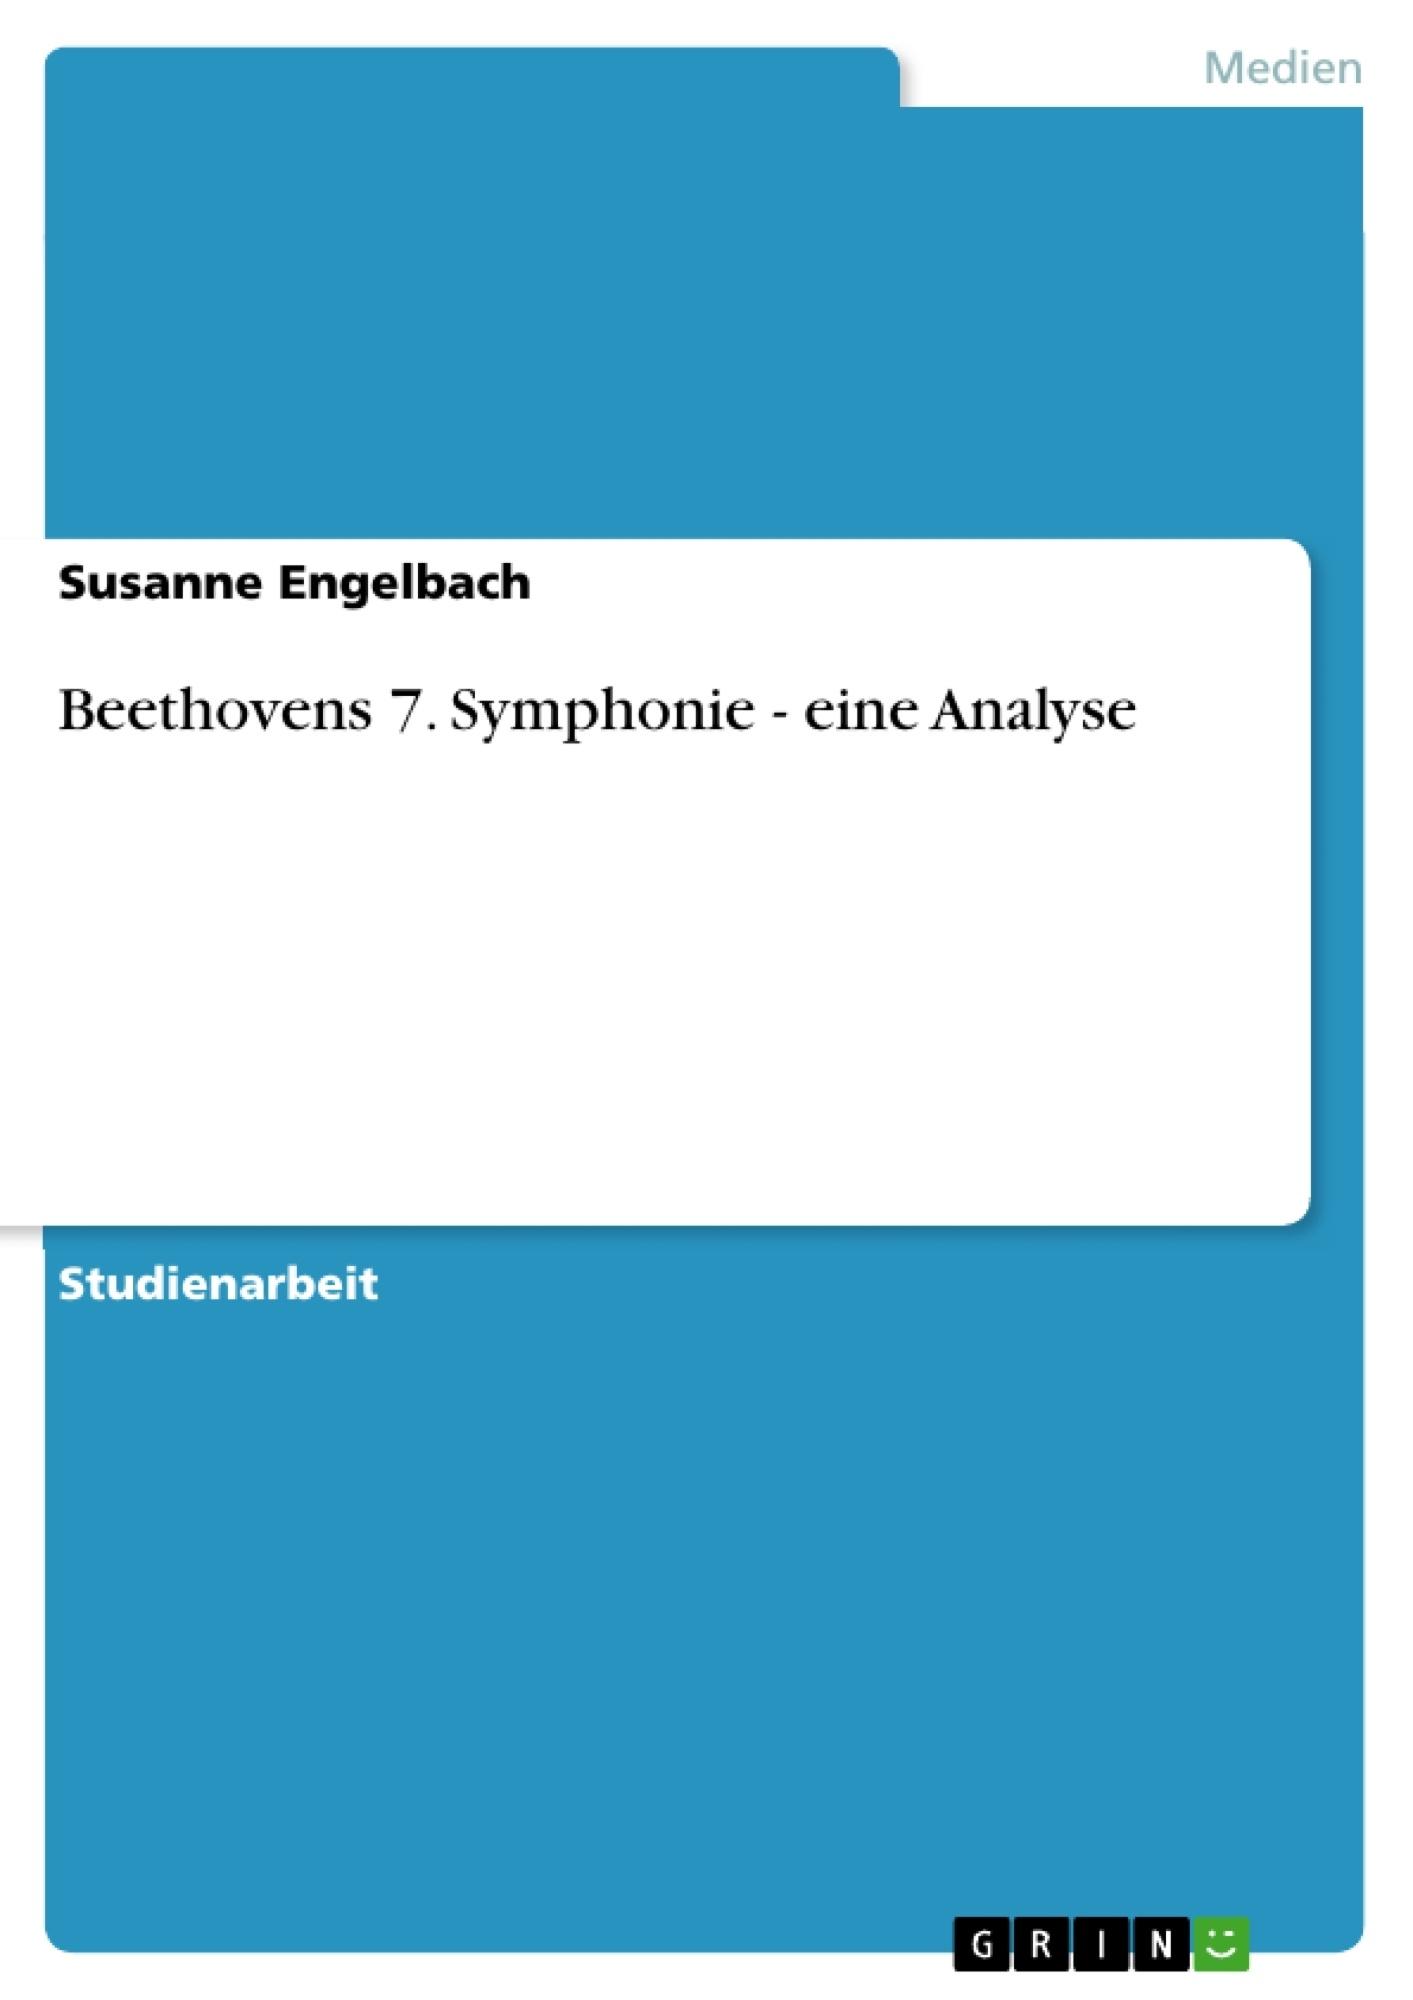 Titel: Beethovens 7. Symphonie - eine Analyse